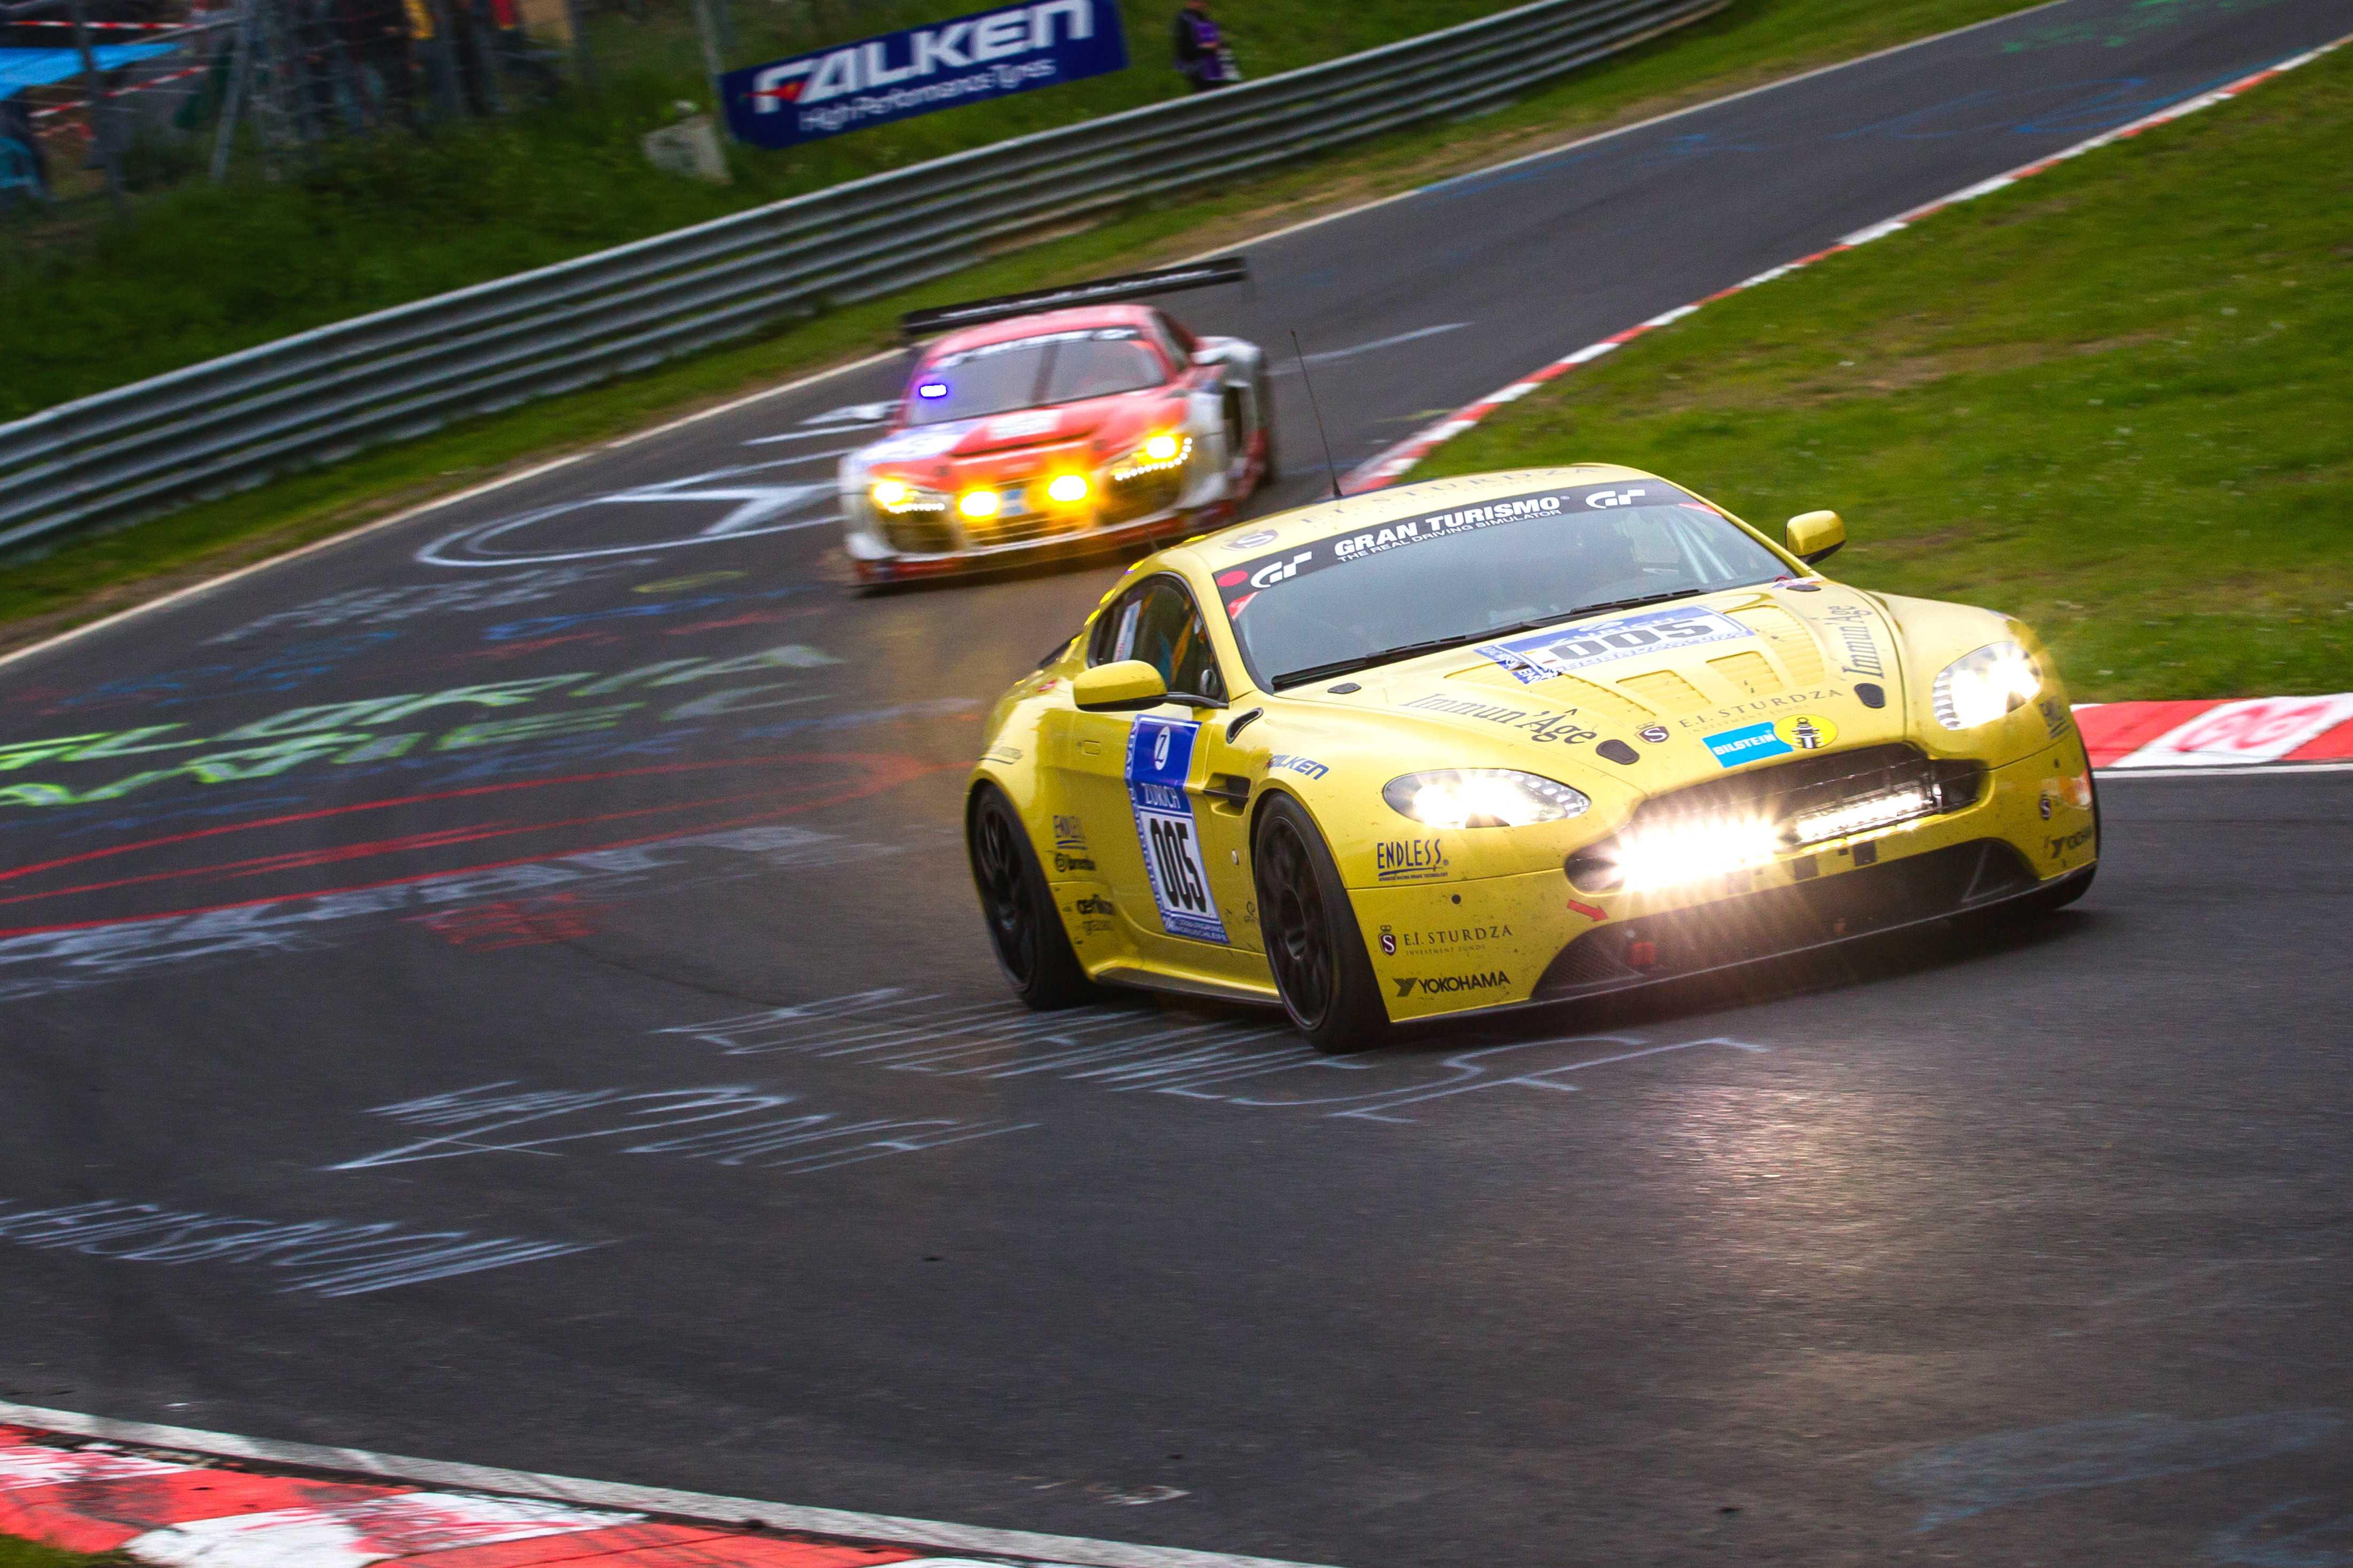 Aston Martin V12 Vantage Nurburgring 24 2013